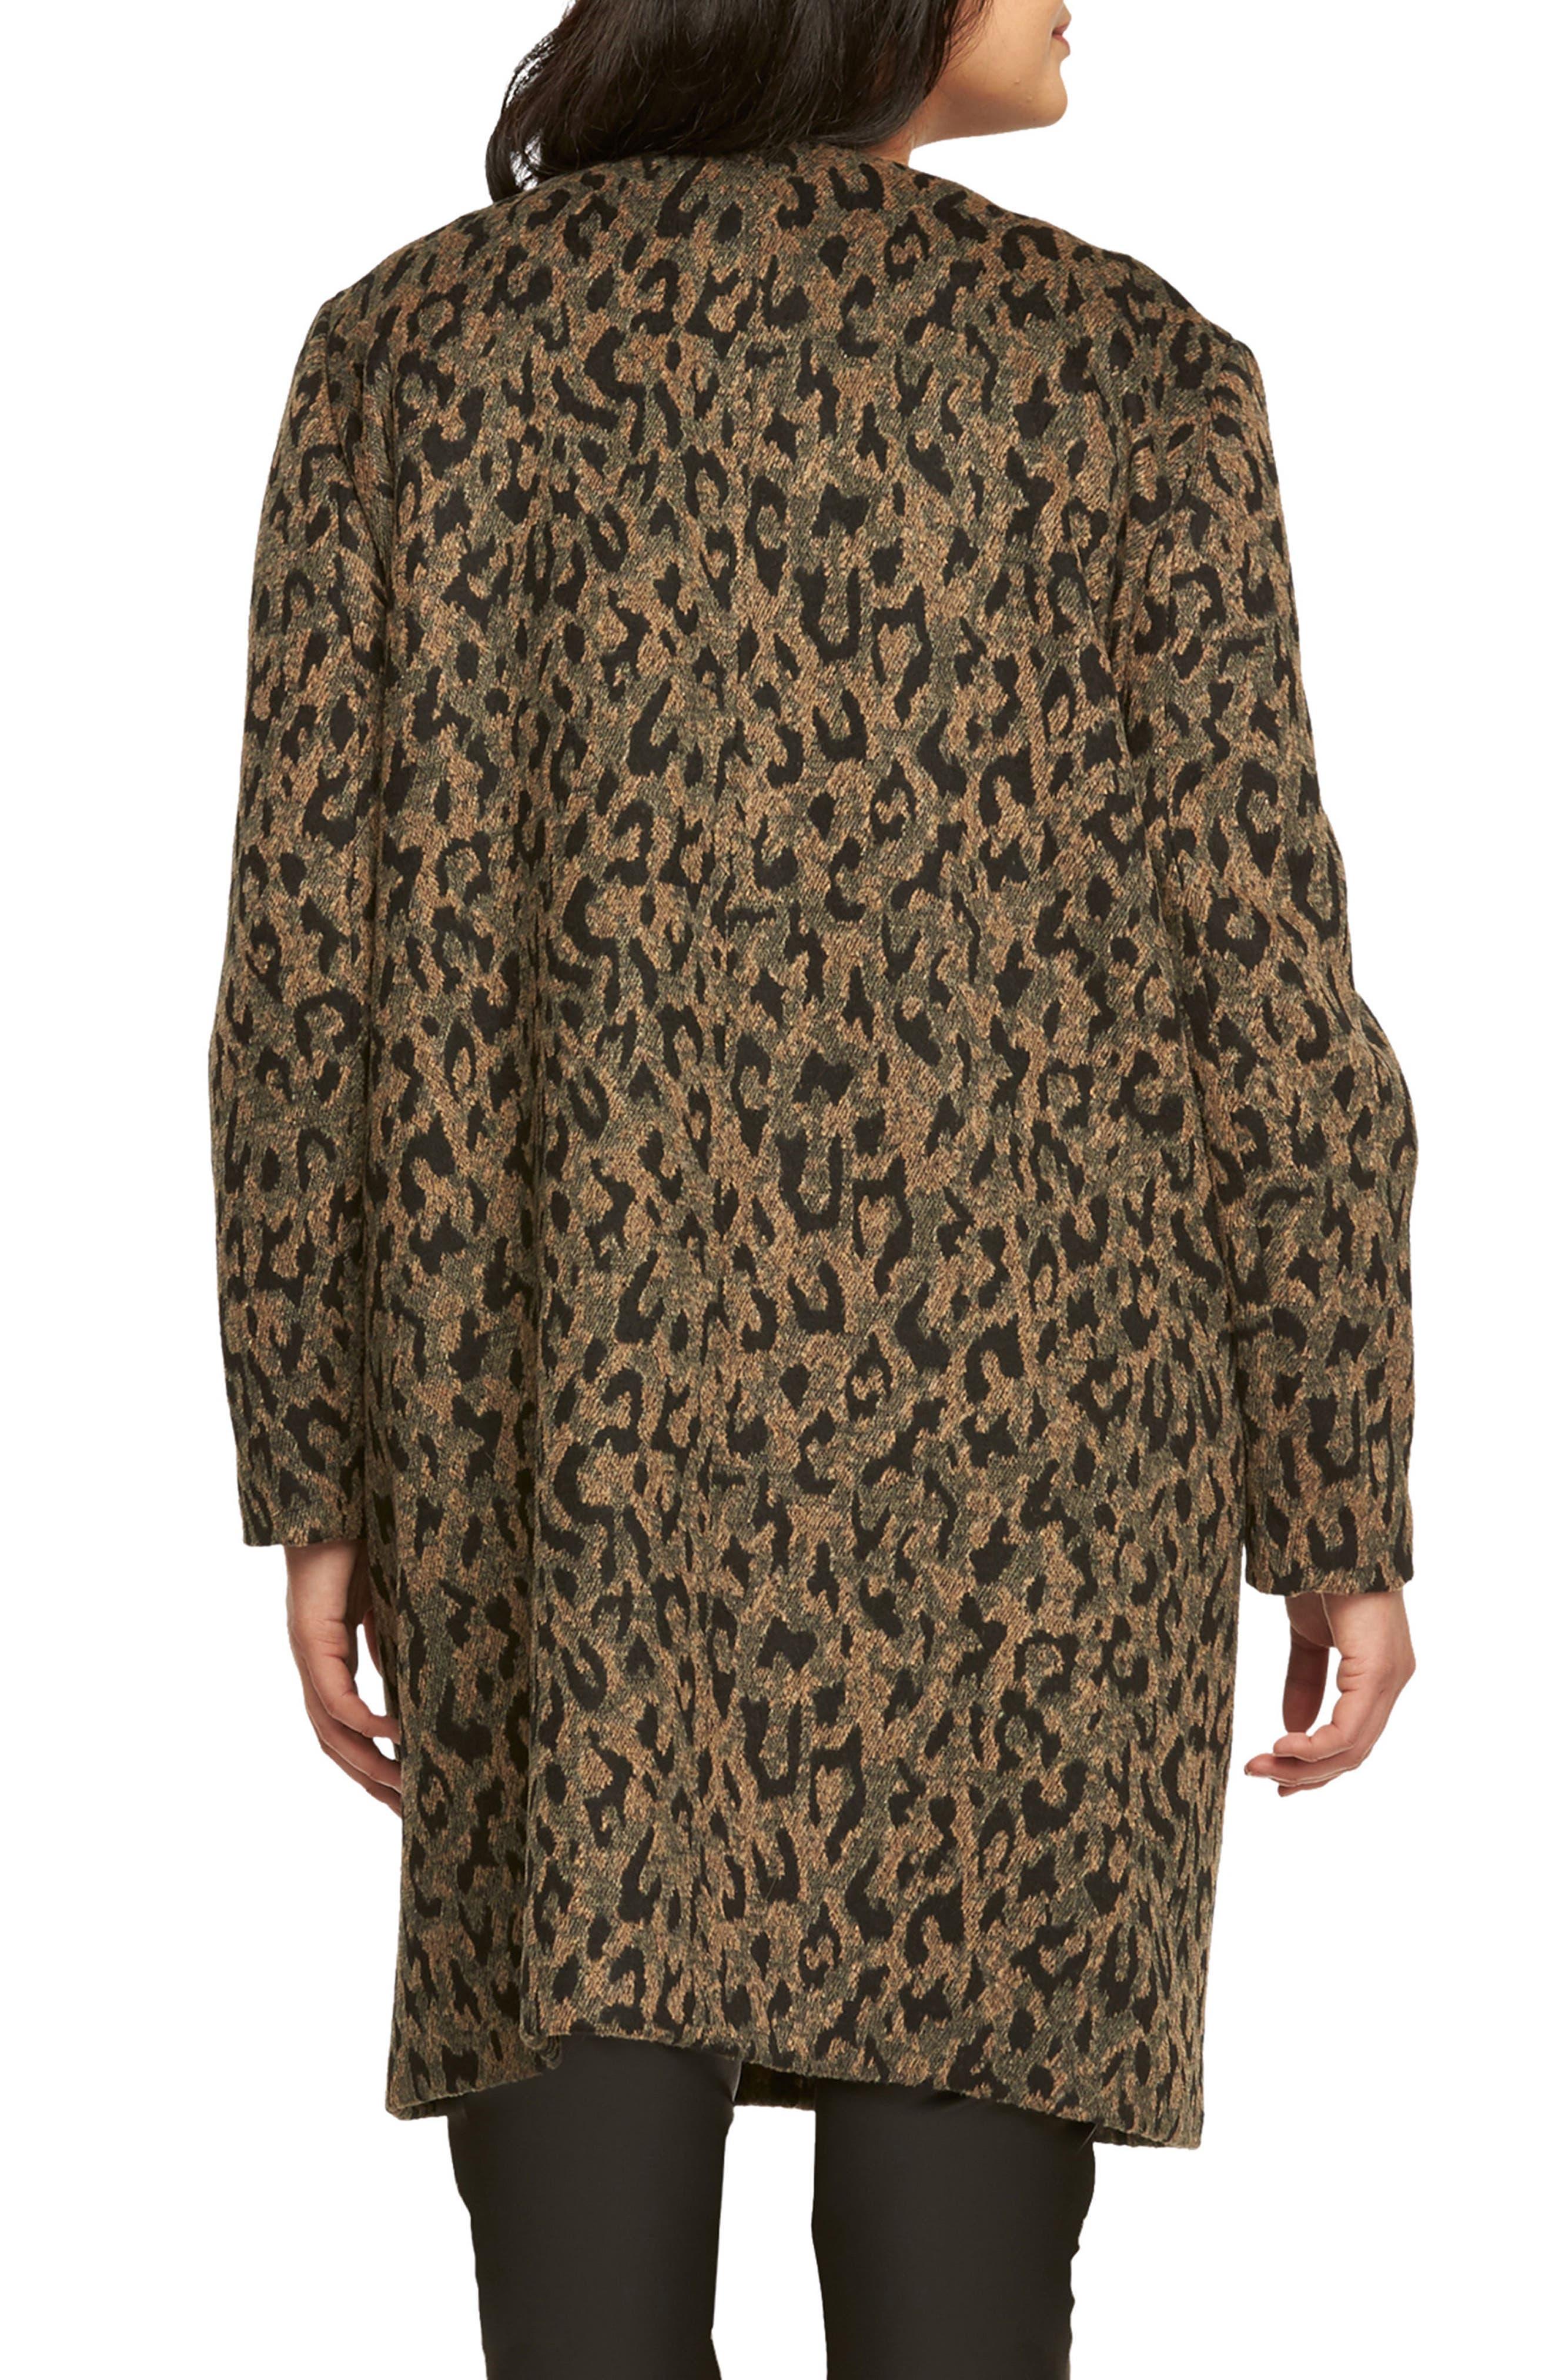 Ashton Leopard Print Coat,                             Alternate thumbnail 2, color,                             Leopard